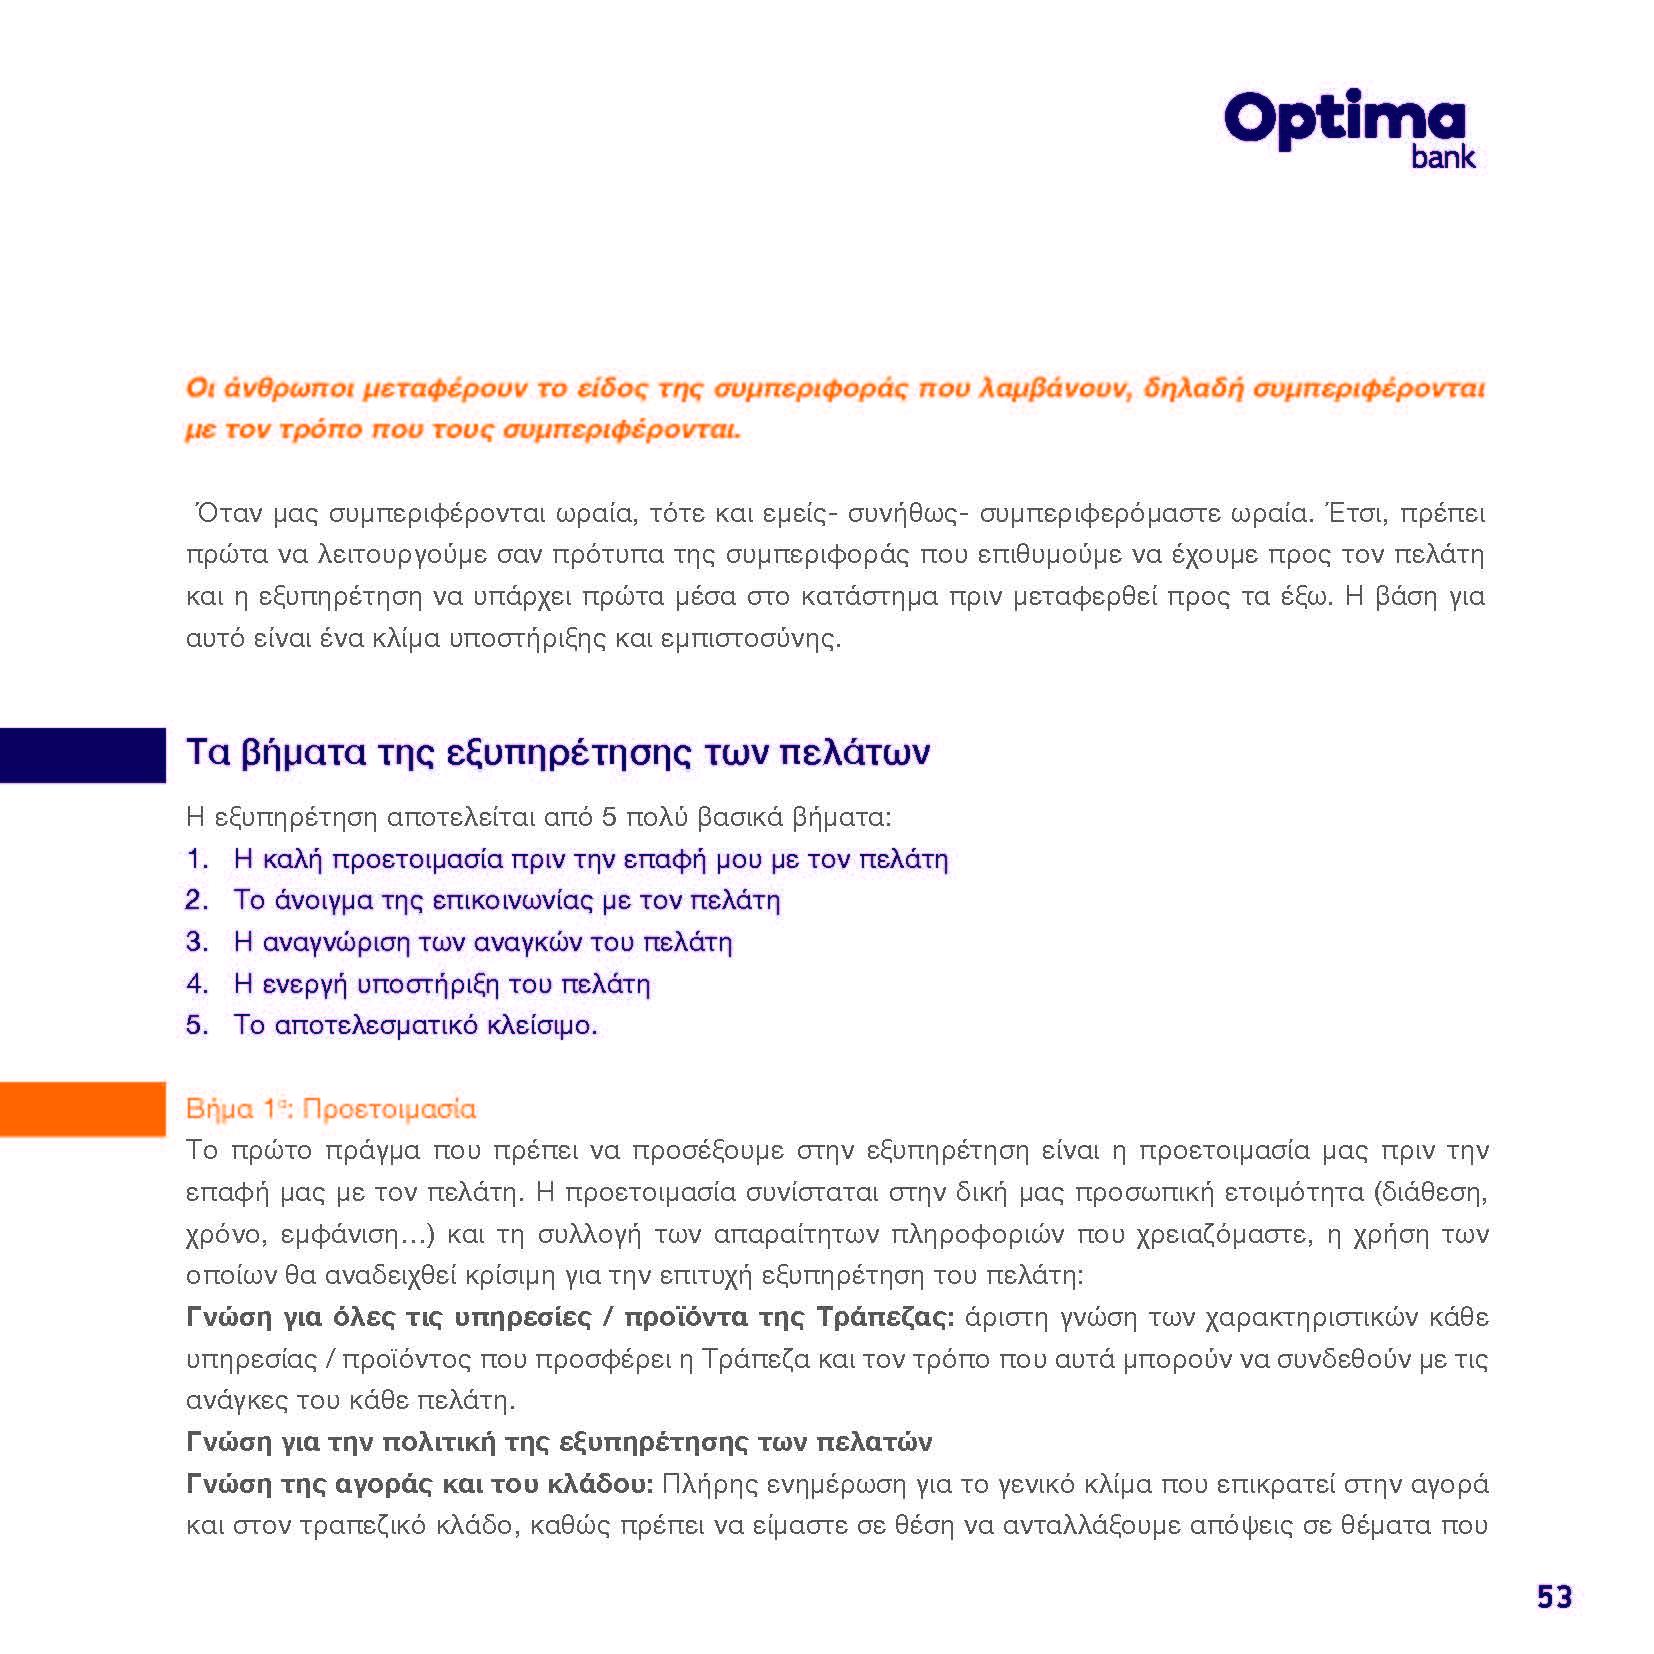 https://www.jib.gr/wp-content/uploads/2020/09/OPTIMA-BANK-BOOKLET-WEB_Page_053.jpg